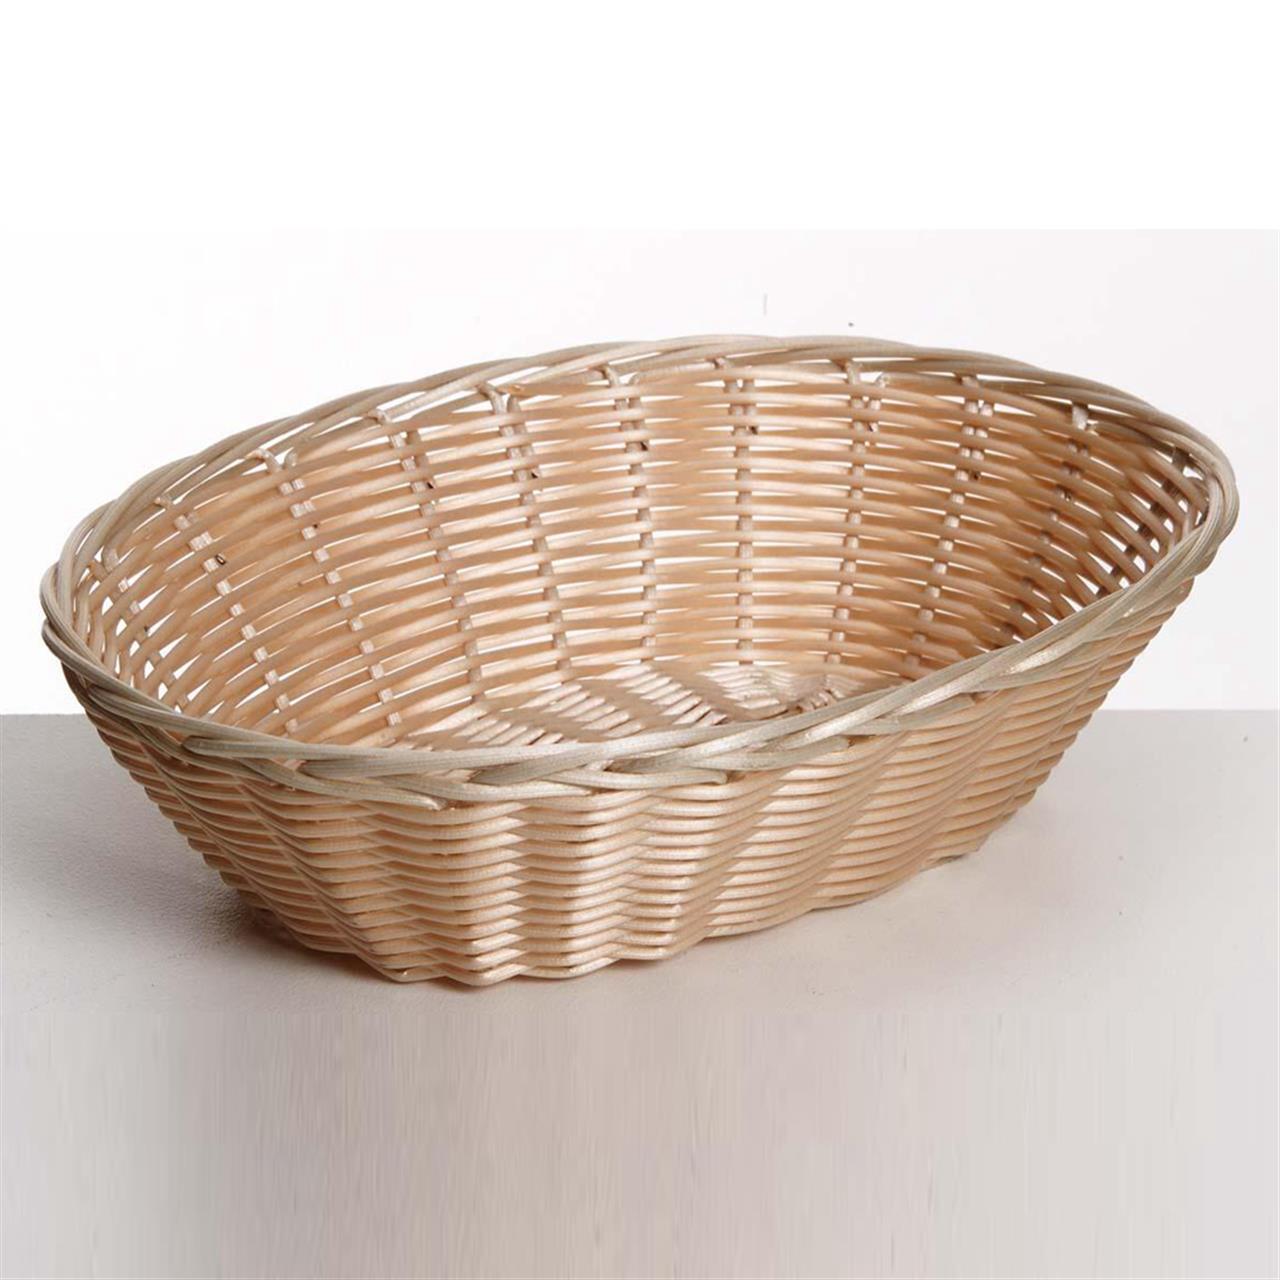 Plastic Rattan Bread Basket